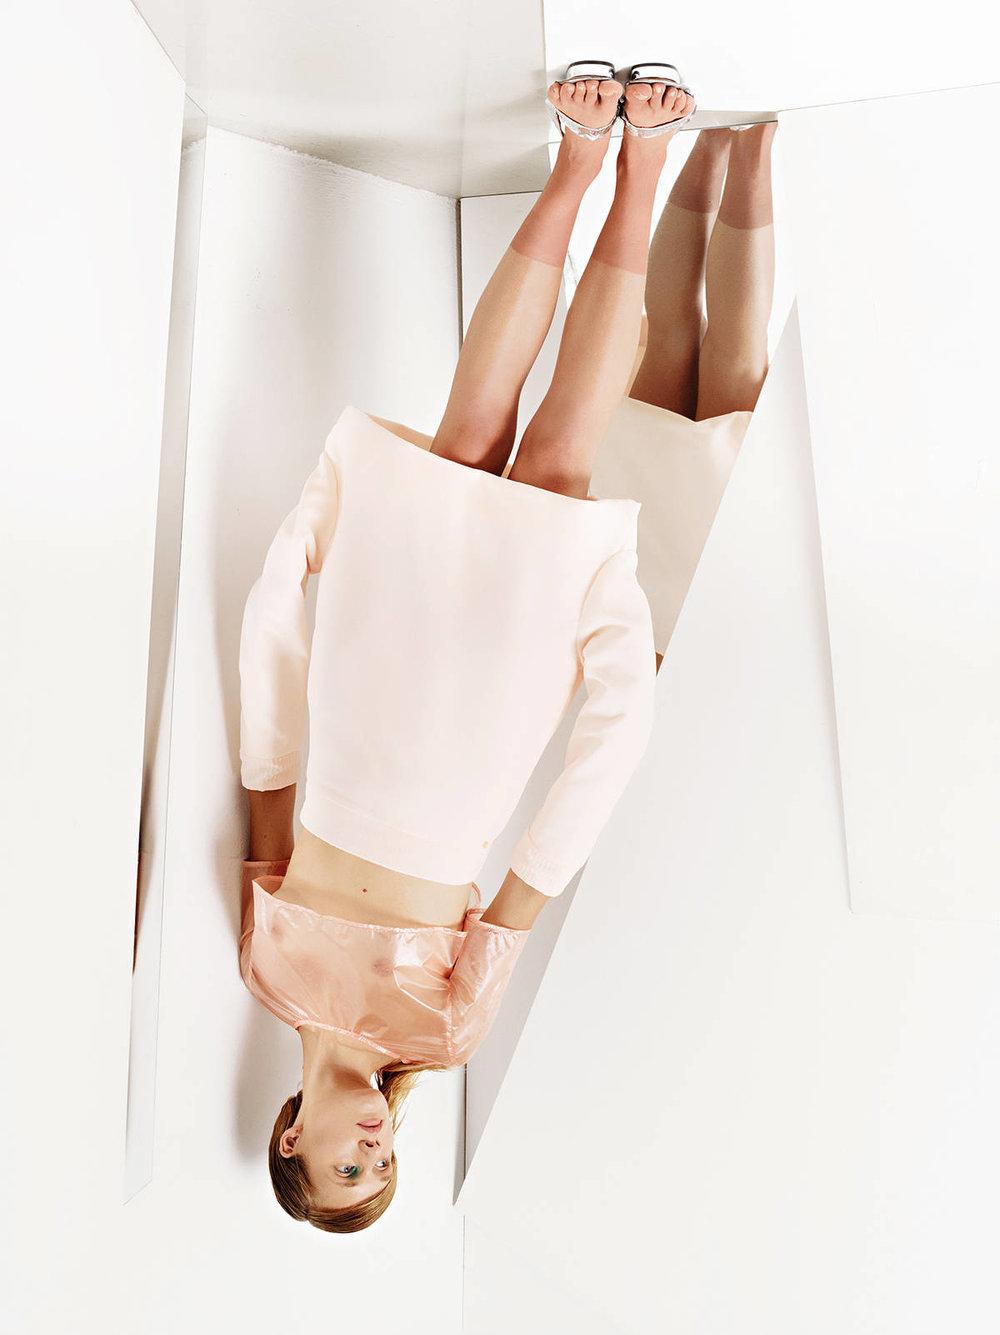 Justine Chanal